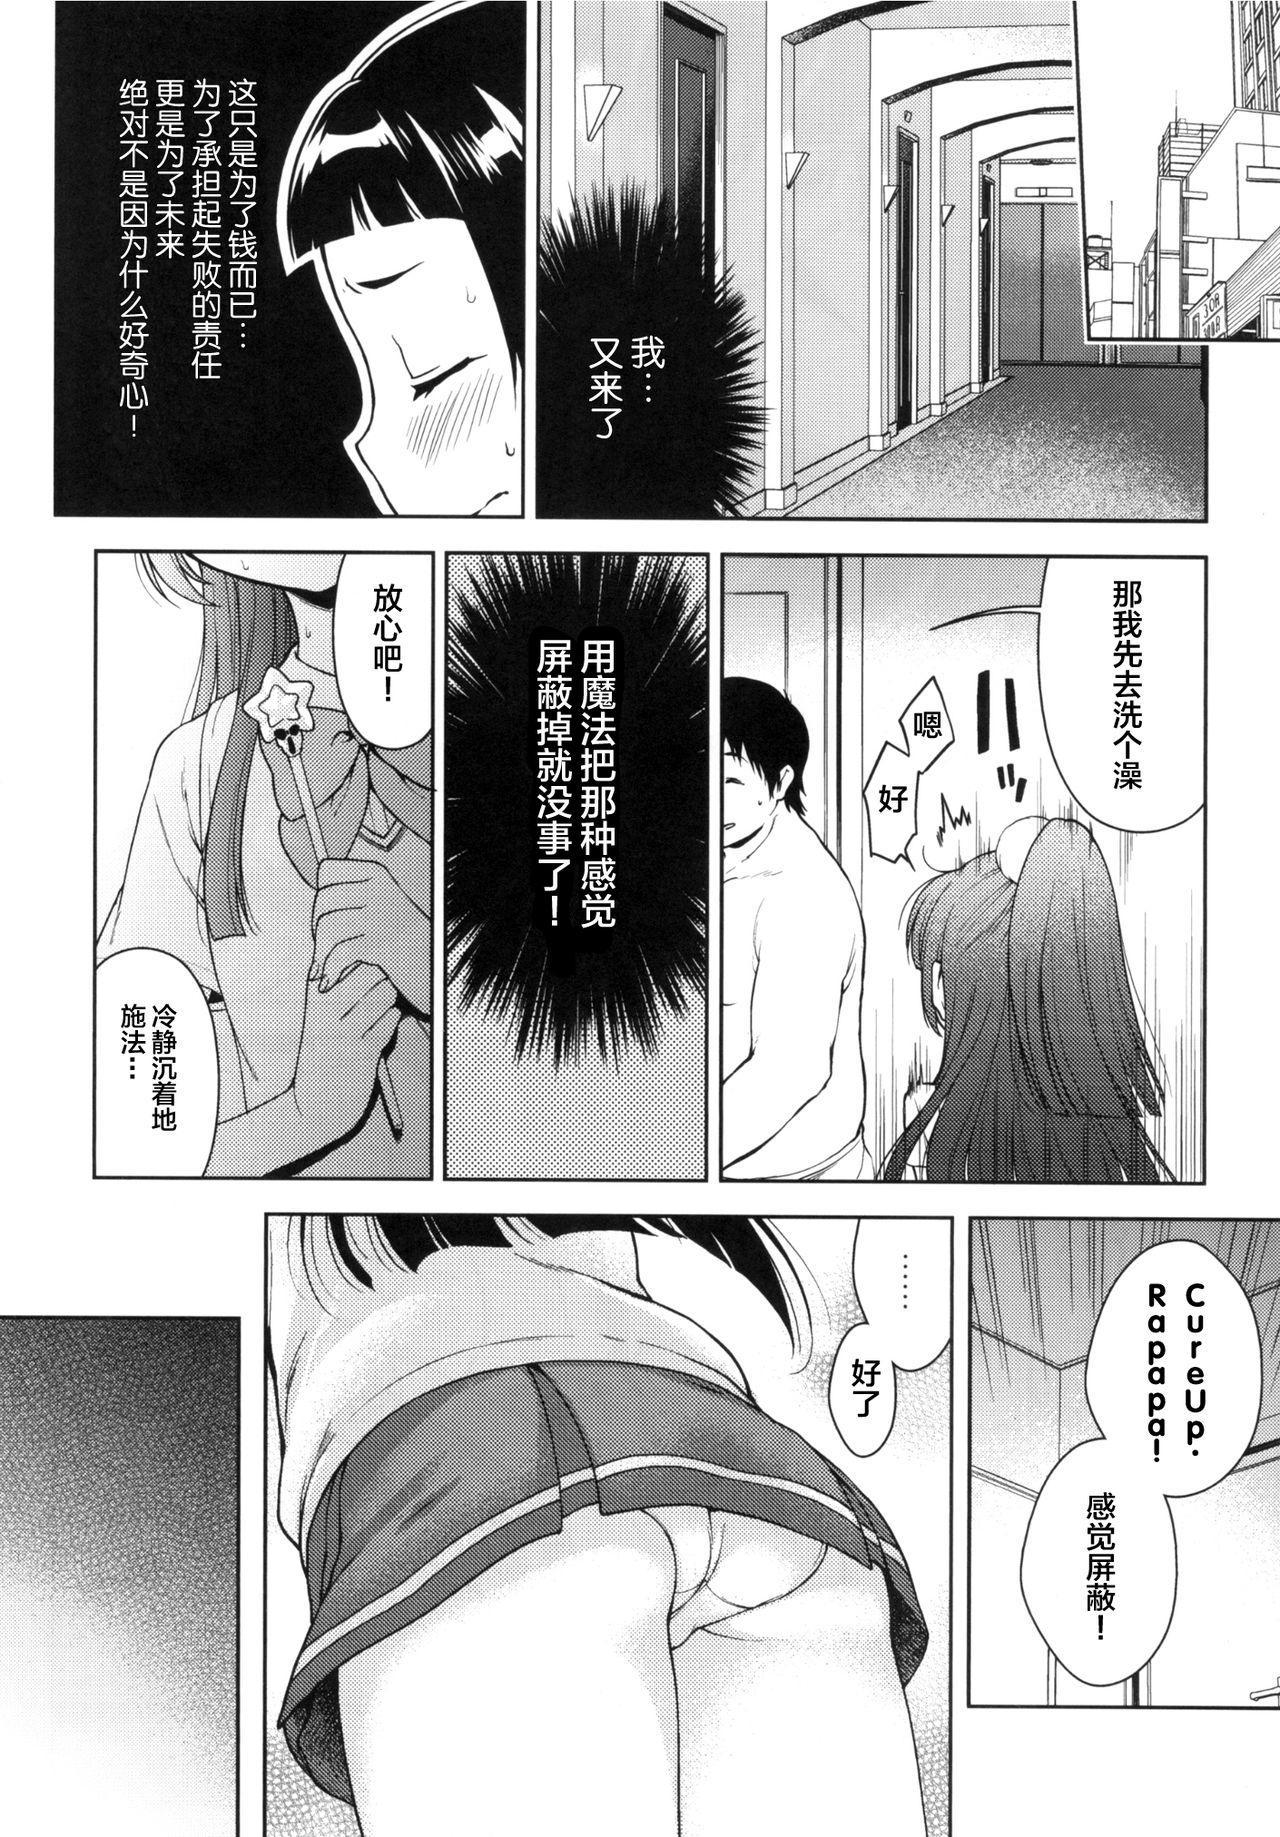 Riko-chan no H na Arbeit 11